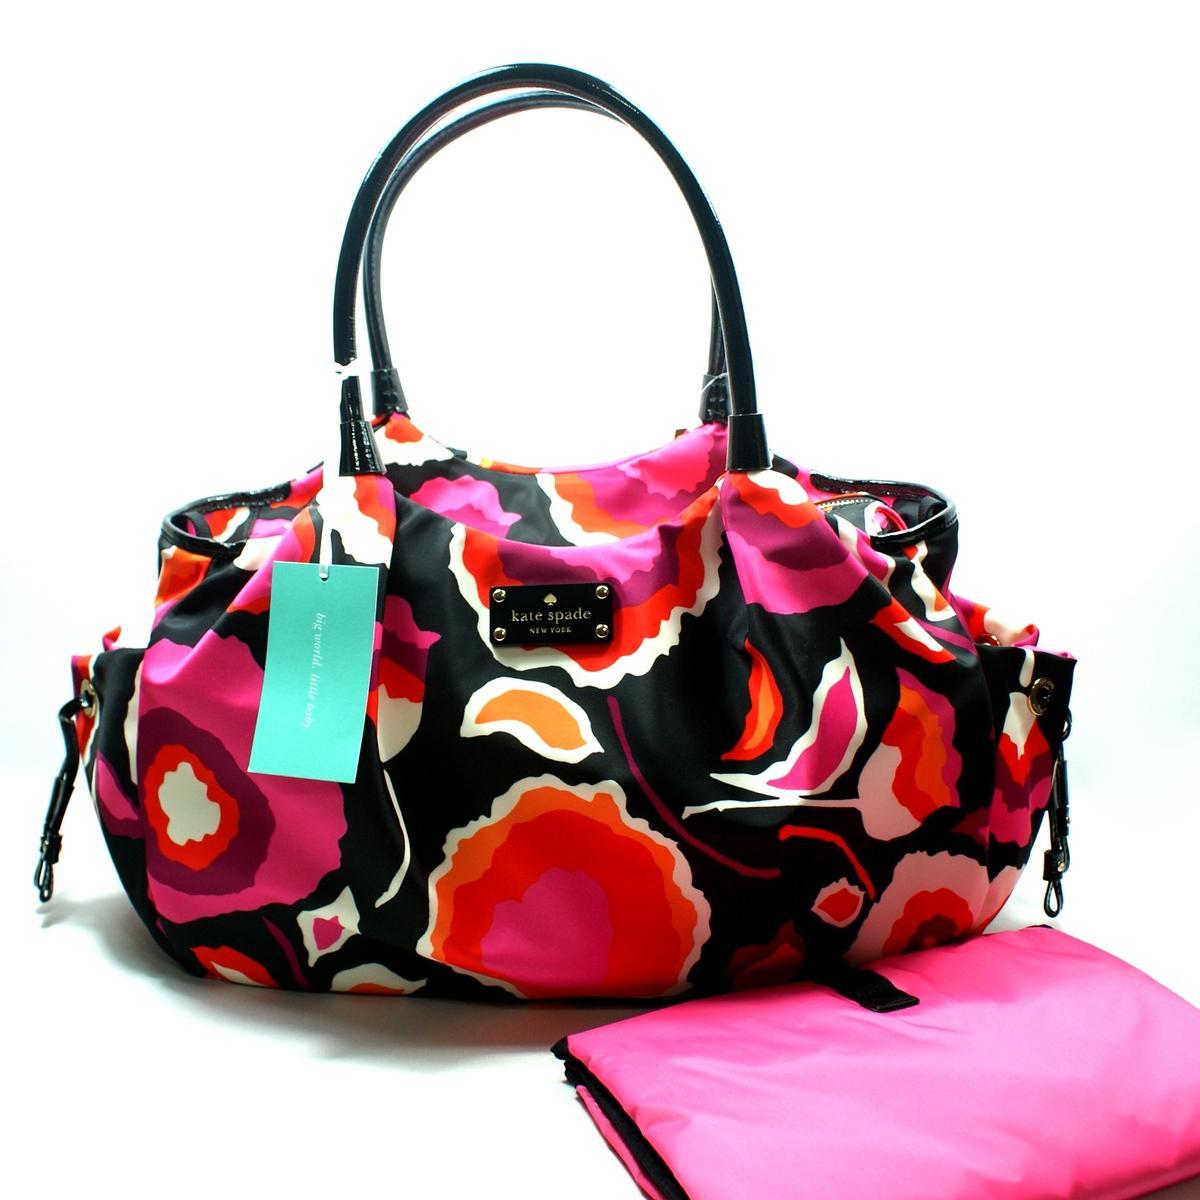 Kate Spade Stevie Baby Bag Giza Diaper Bag Shoulder Bag